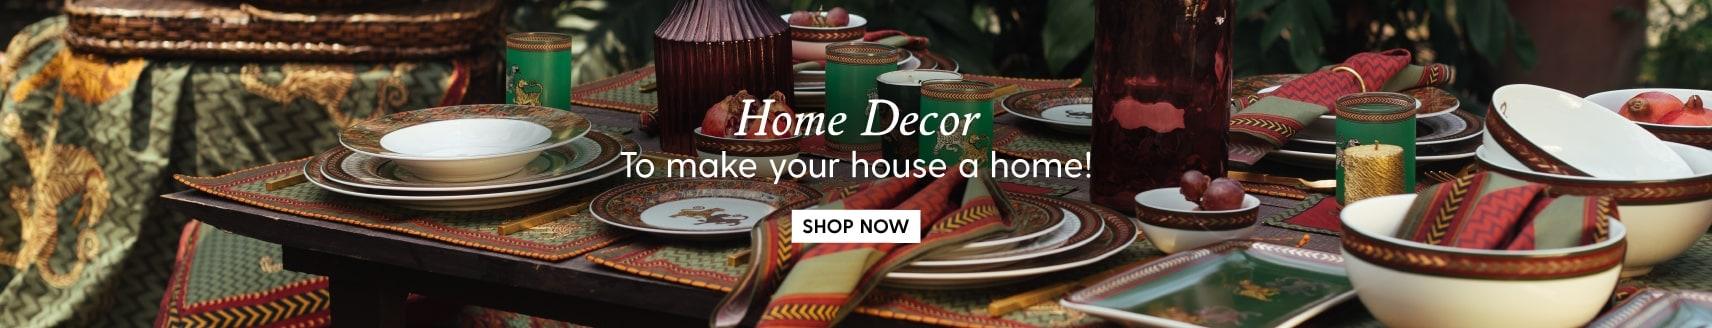 home-living?utm_source=LandingPage&utm_medium=Banner&utm_campaign=Home-Decor